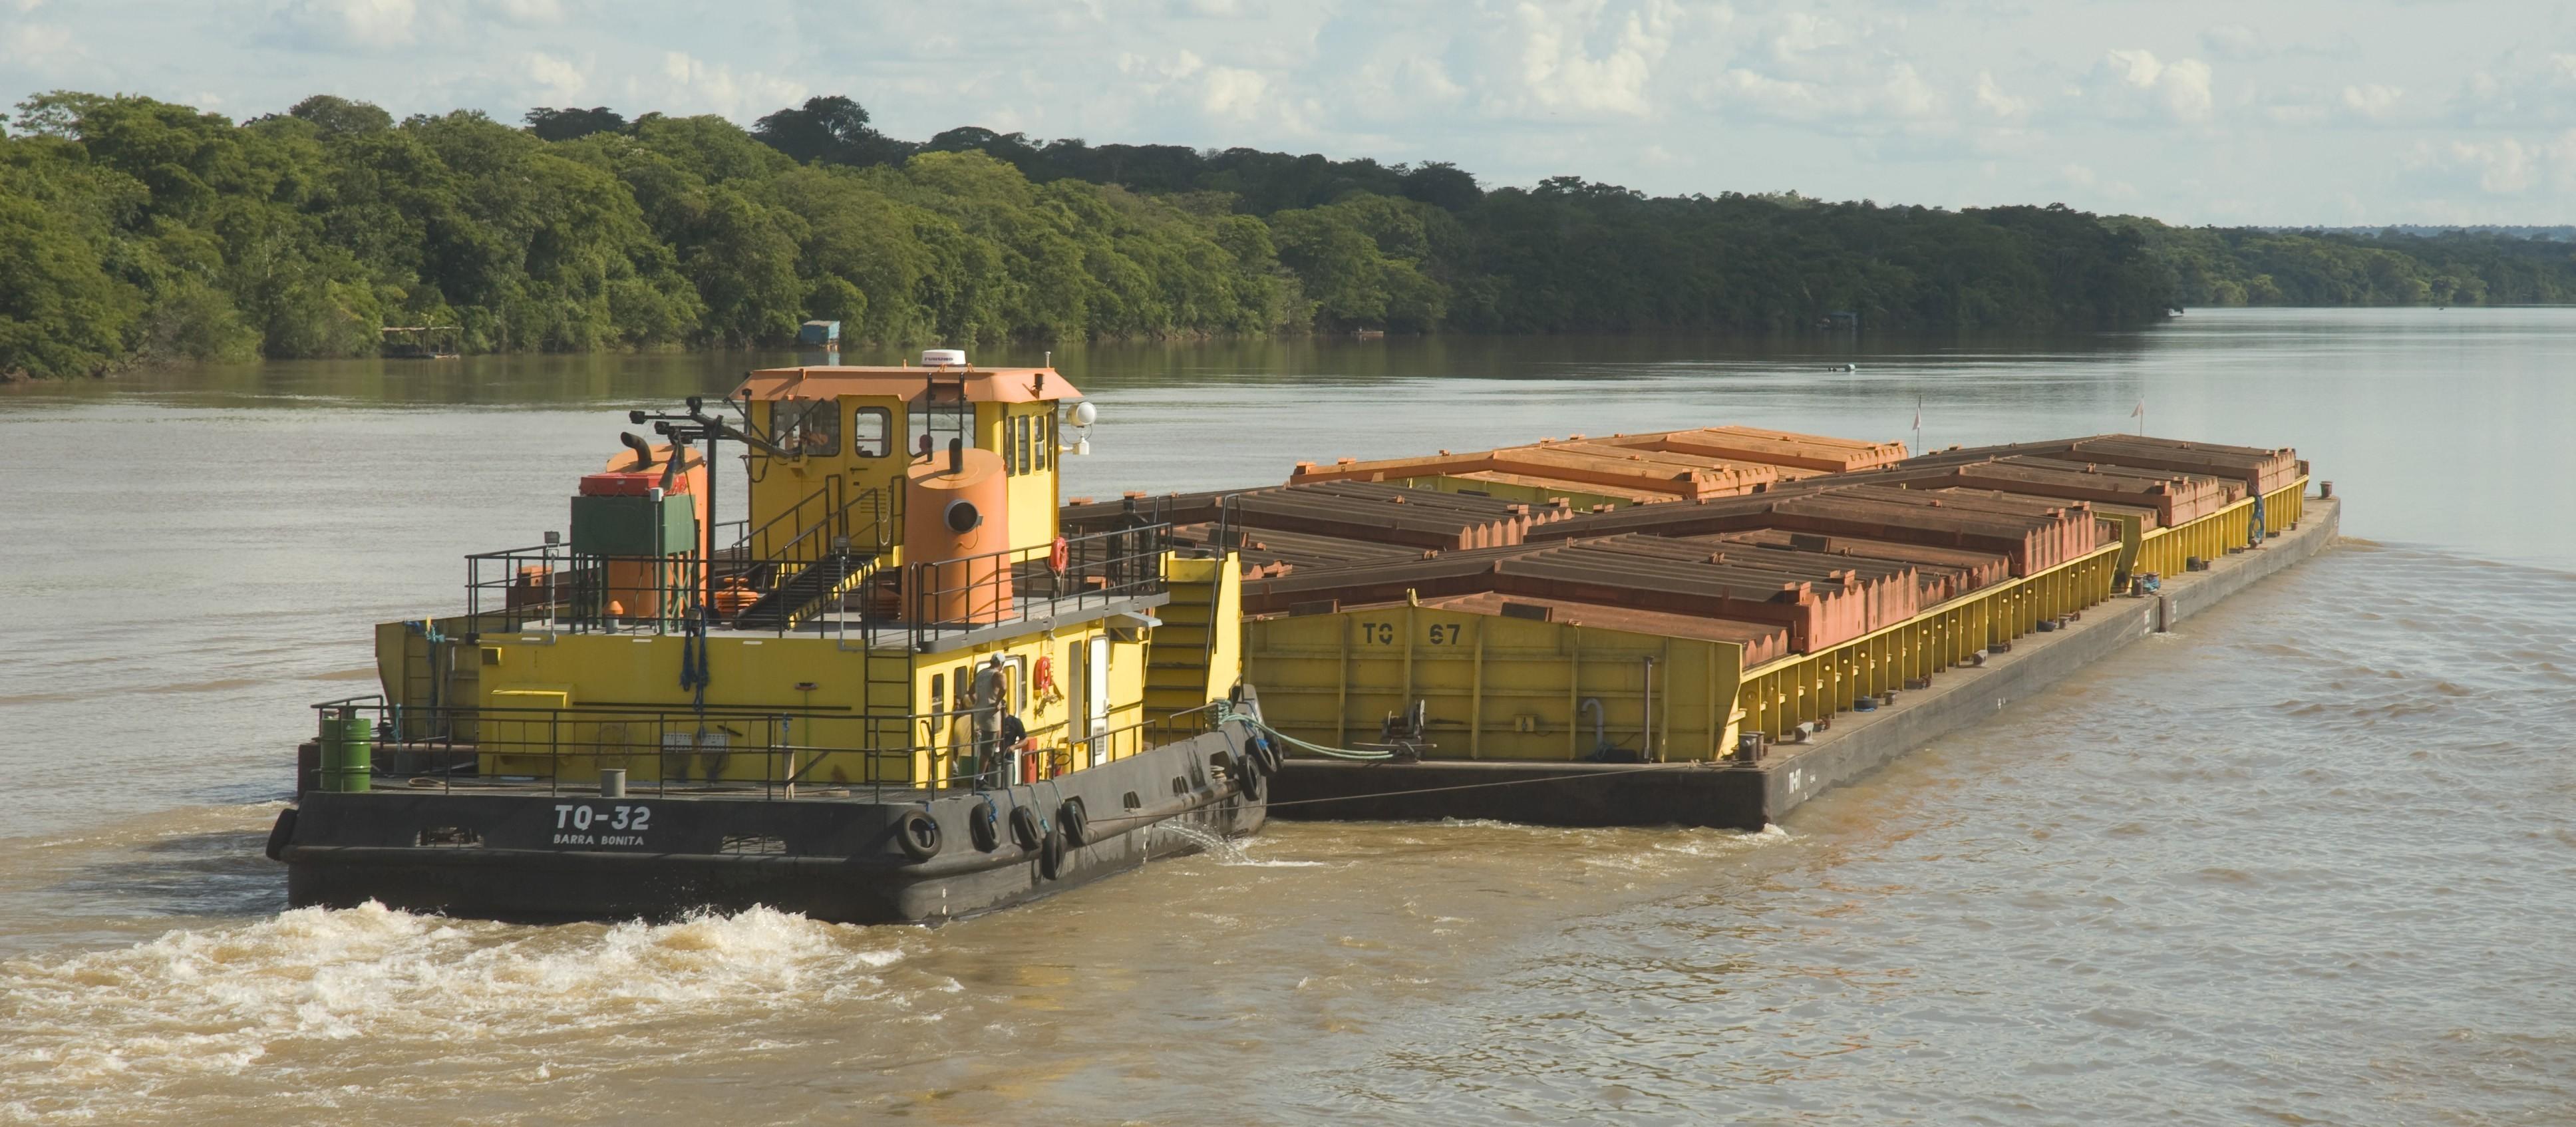 Brasil só utiliza um terço da malha hidroviária